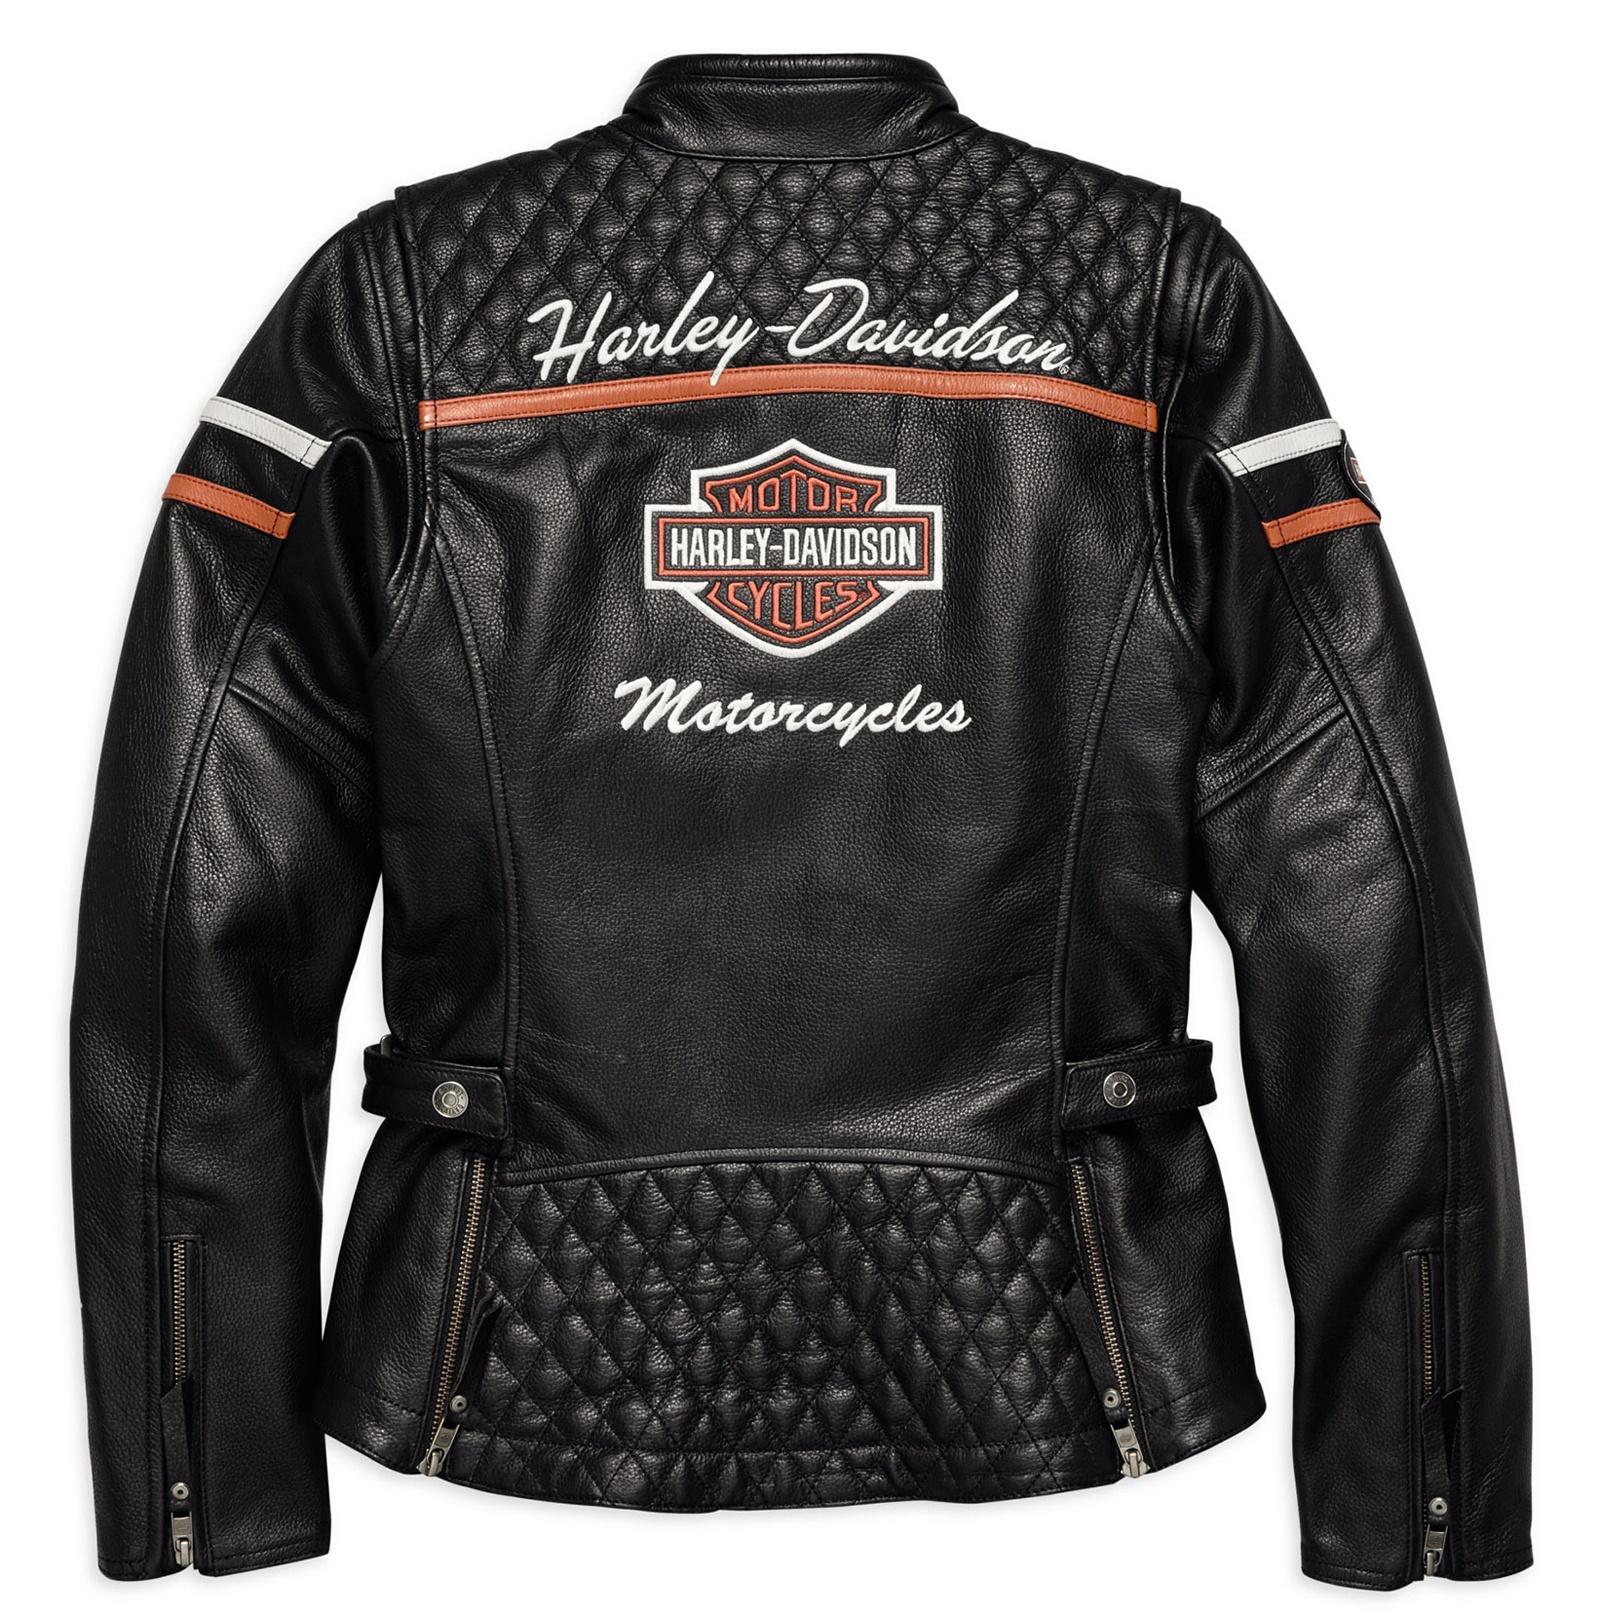 98030 18ew harley davidson leather jacket miss enthusiast. Black Bedroom Furniture Sets. Home Design Ideas